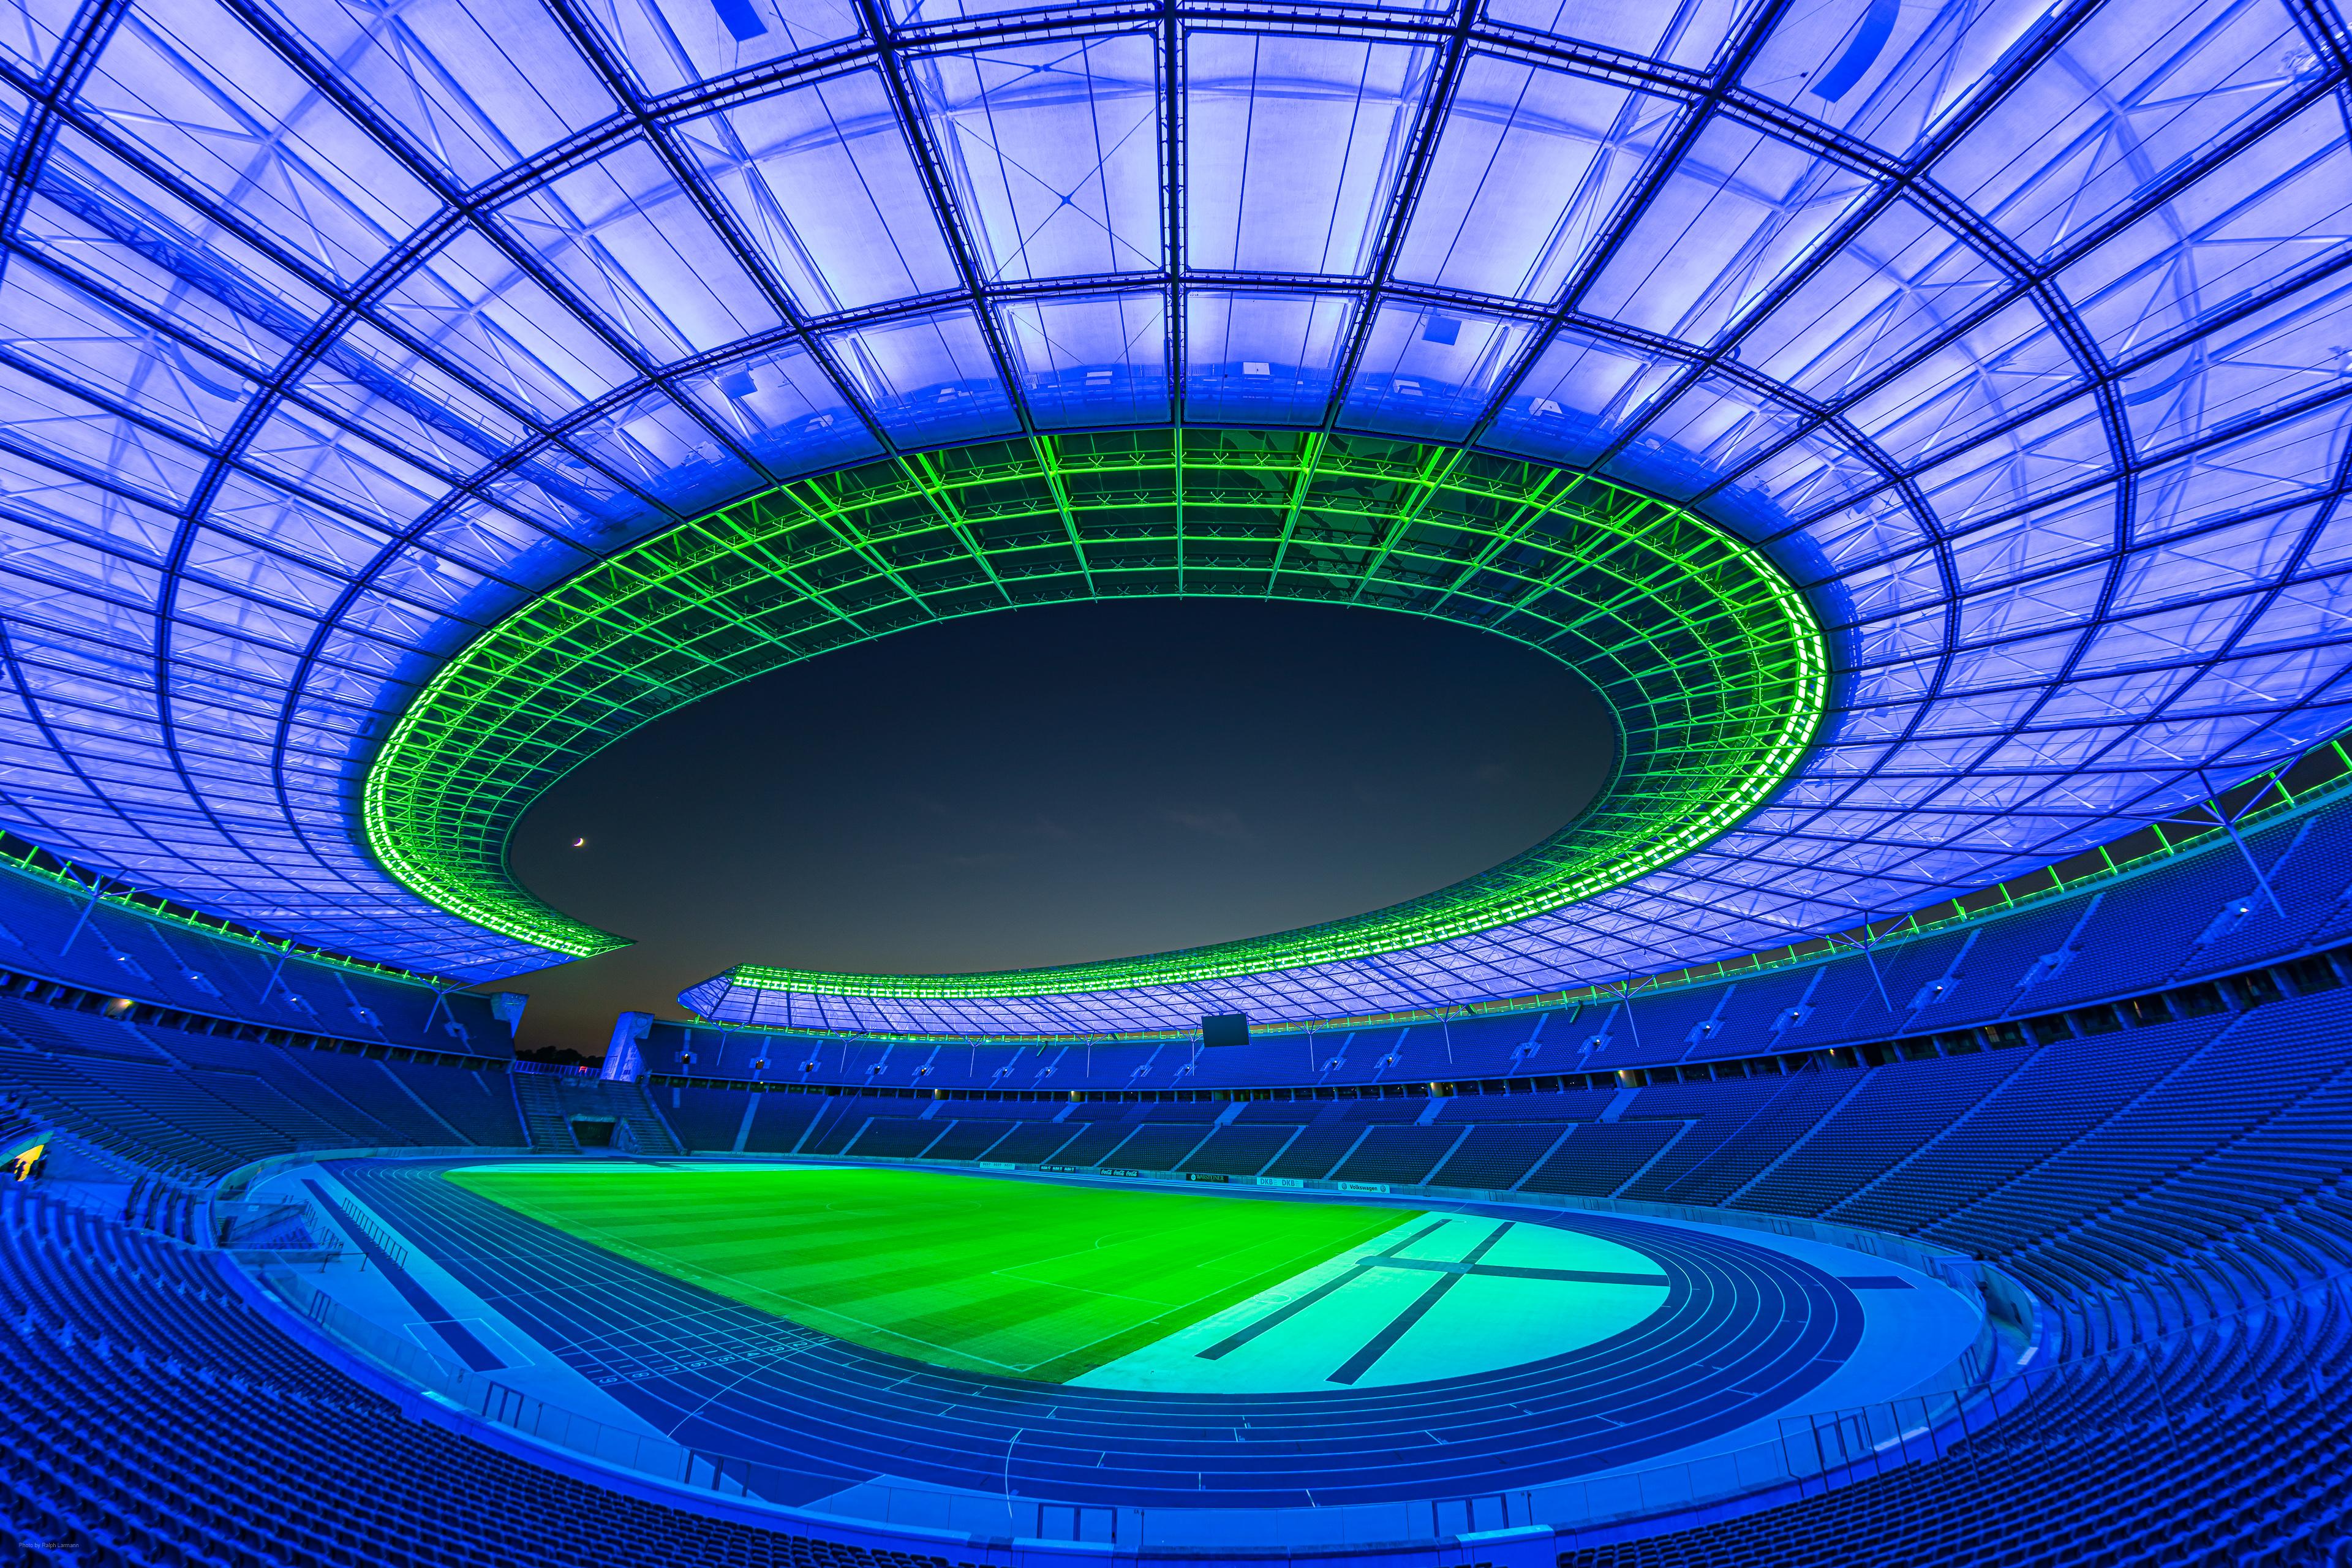 Olympiastadion Berlin 2020